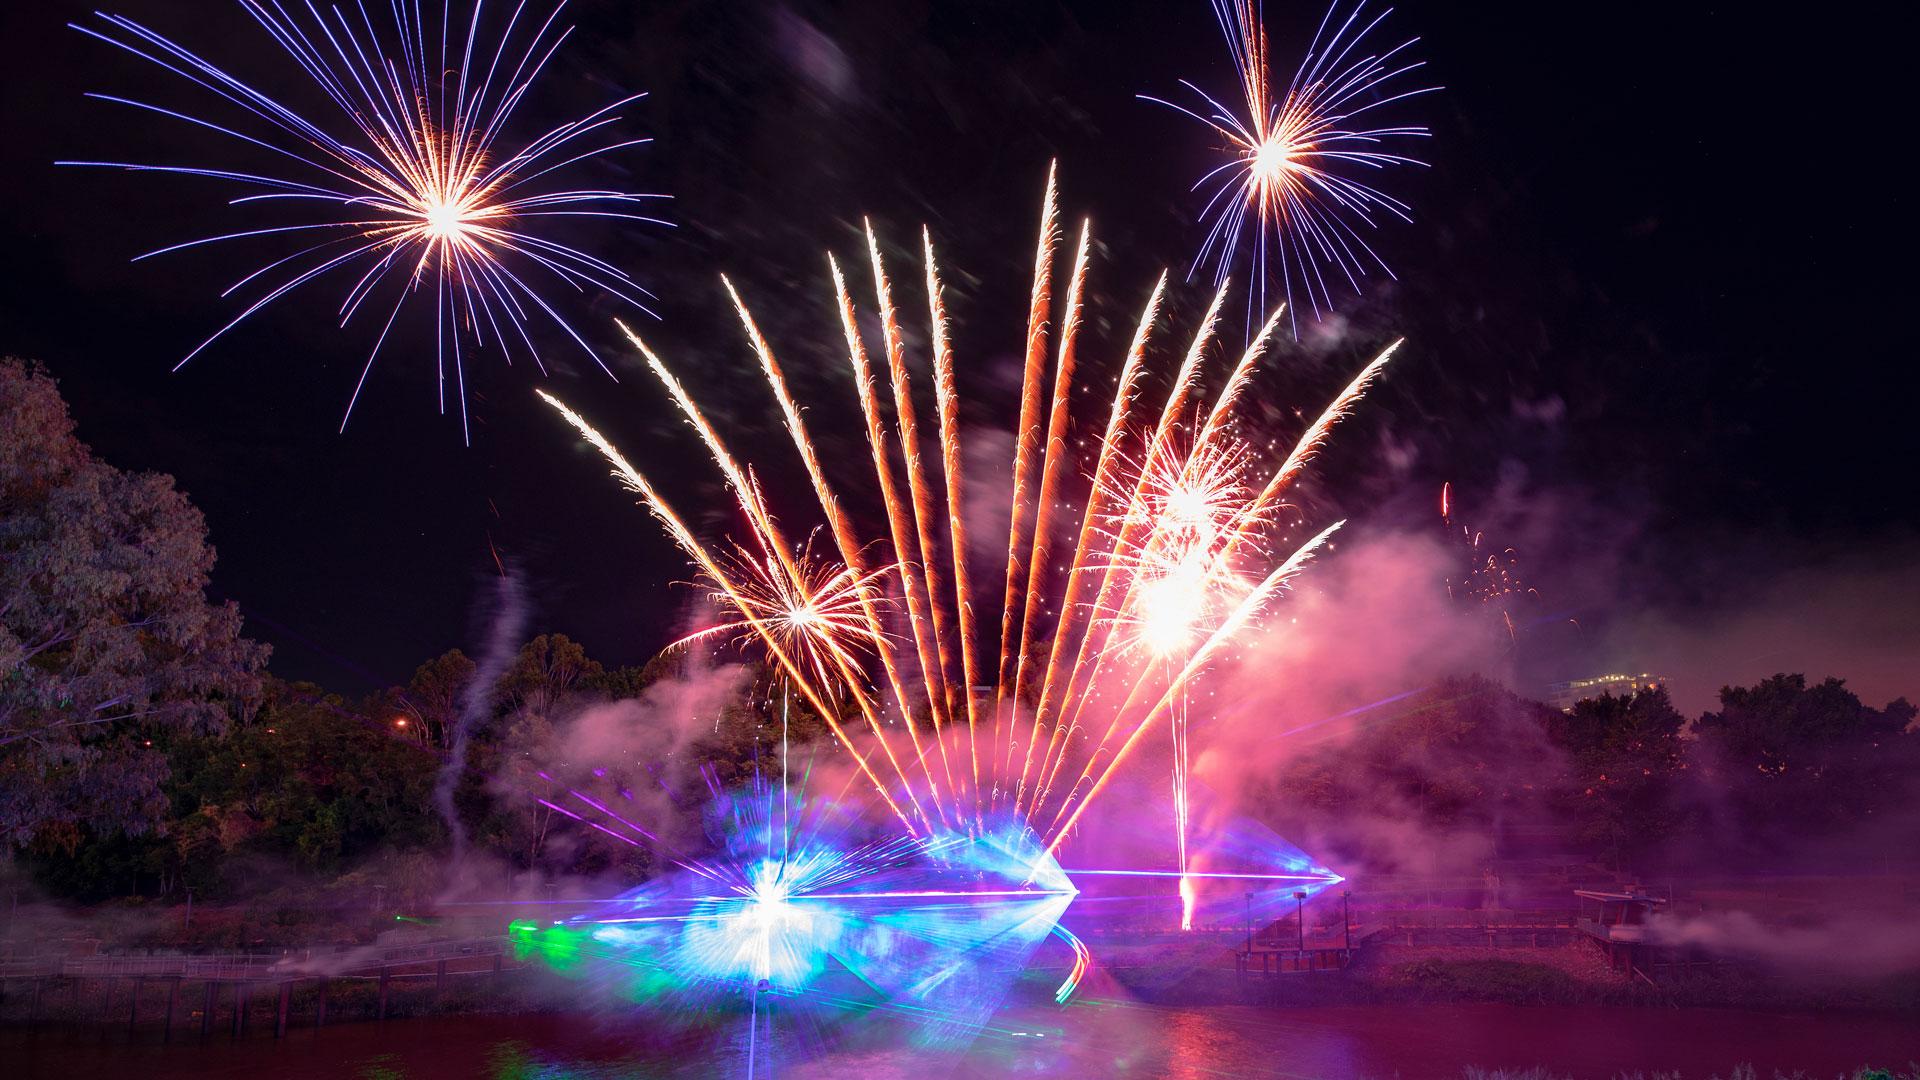 brisbane-fireworks-all-fired-up-fireworks-stage-fx-ipswich-home-slide-2018-1